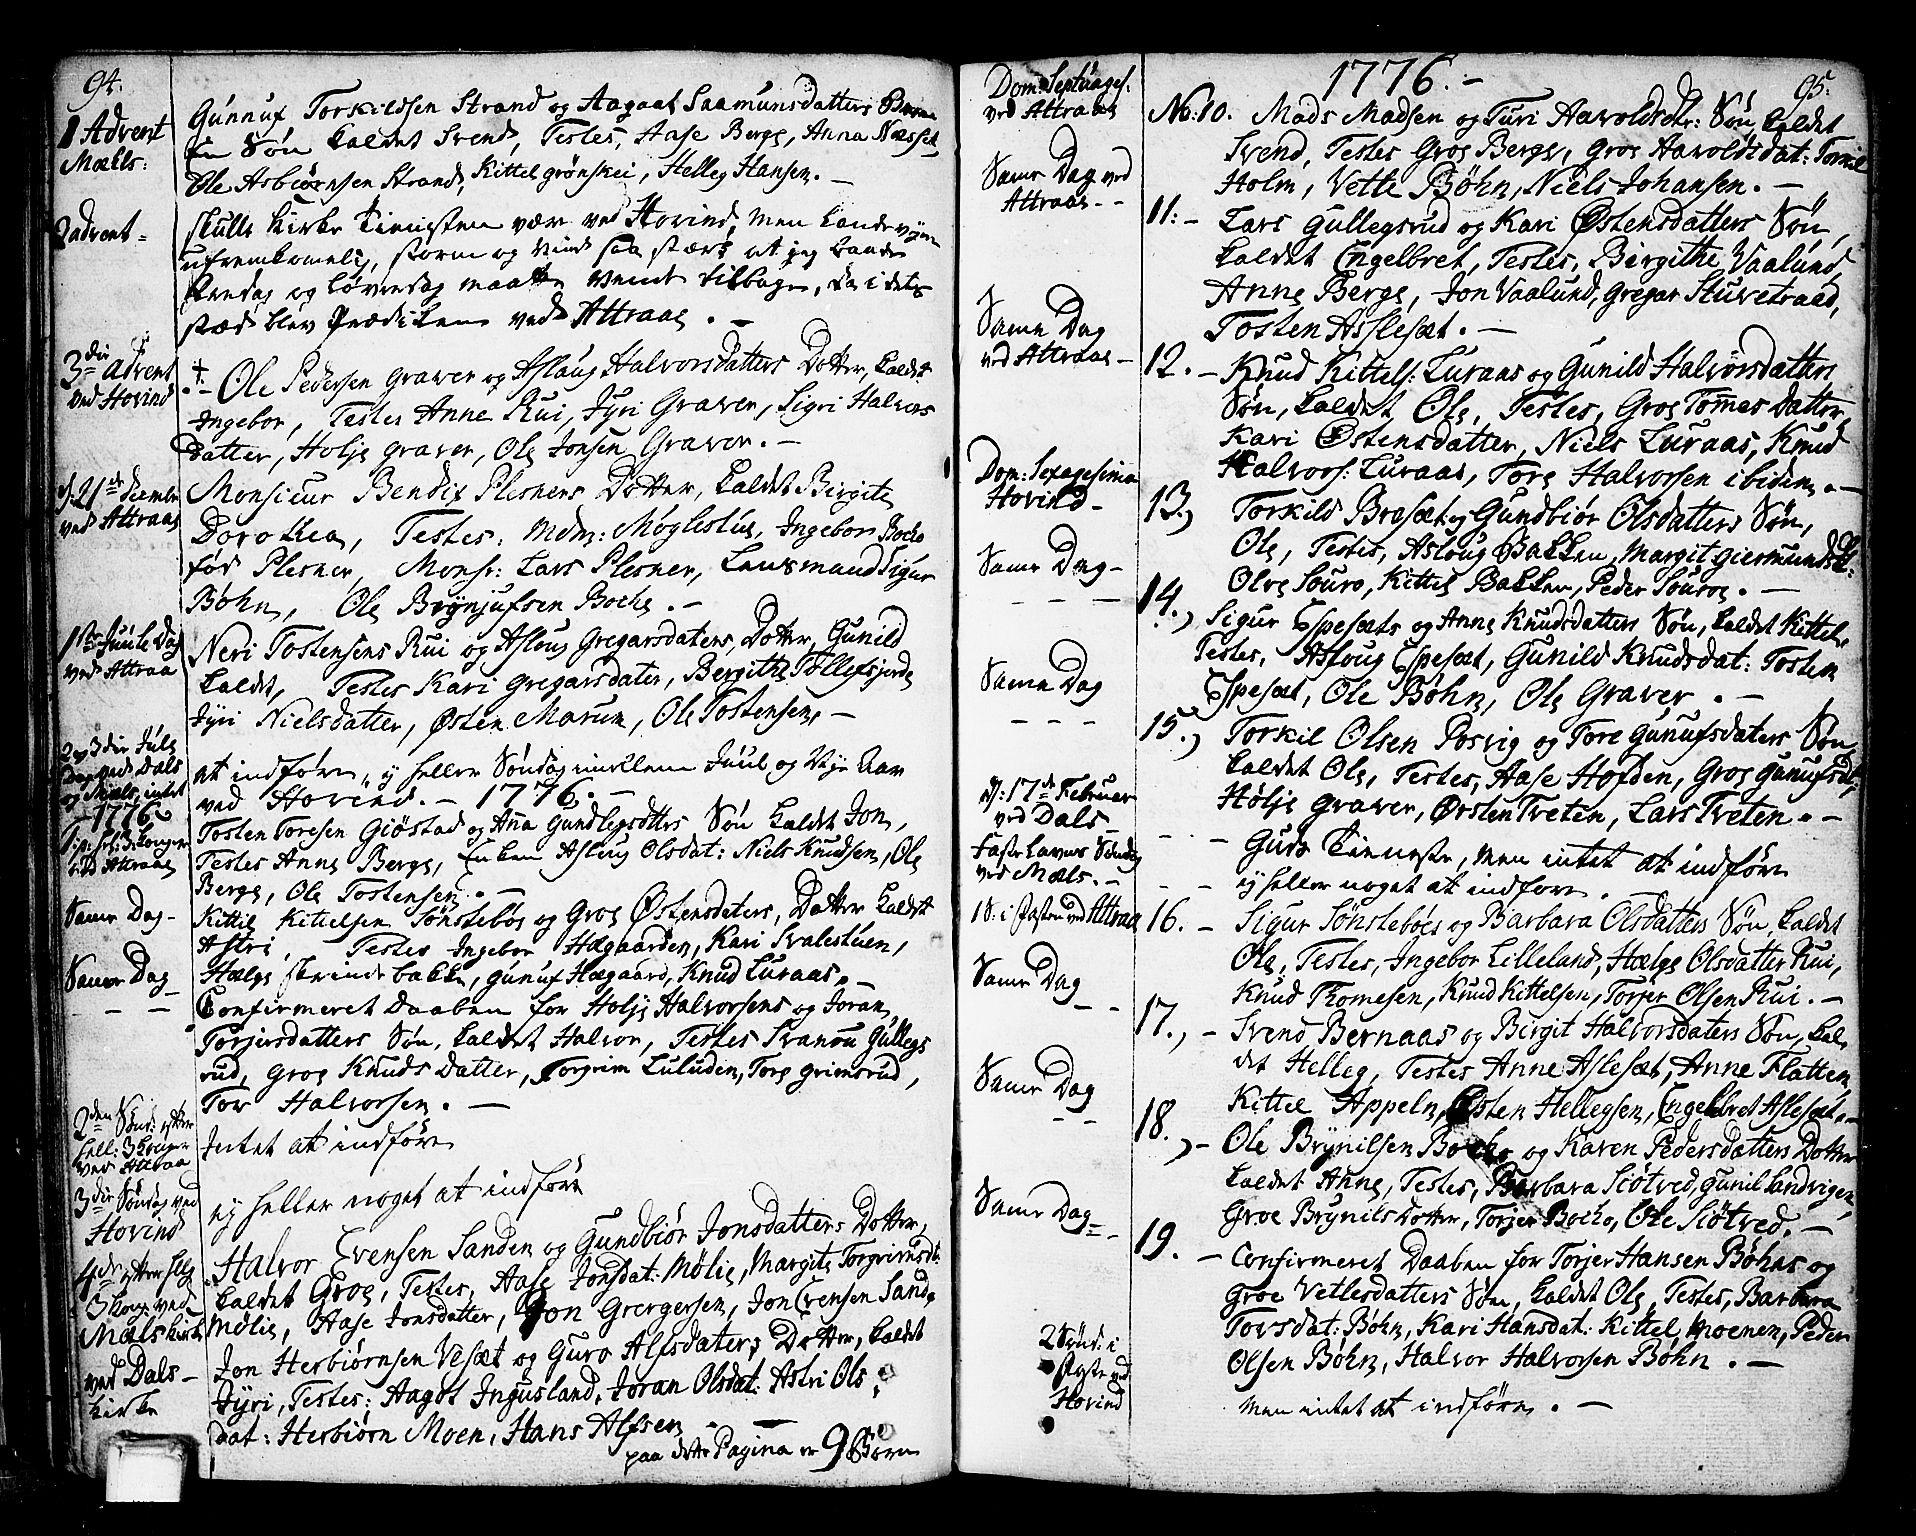 SAKO, Tinn kirkebøker, F/Fa/L0002: Ministerialbok nr. I 2, 1757-1810, s. 94-95